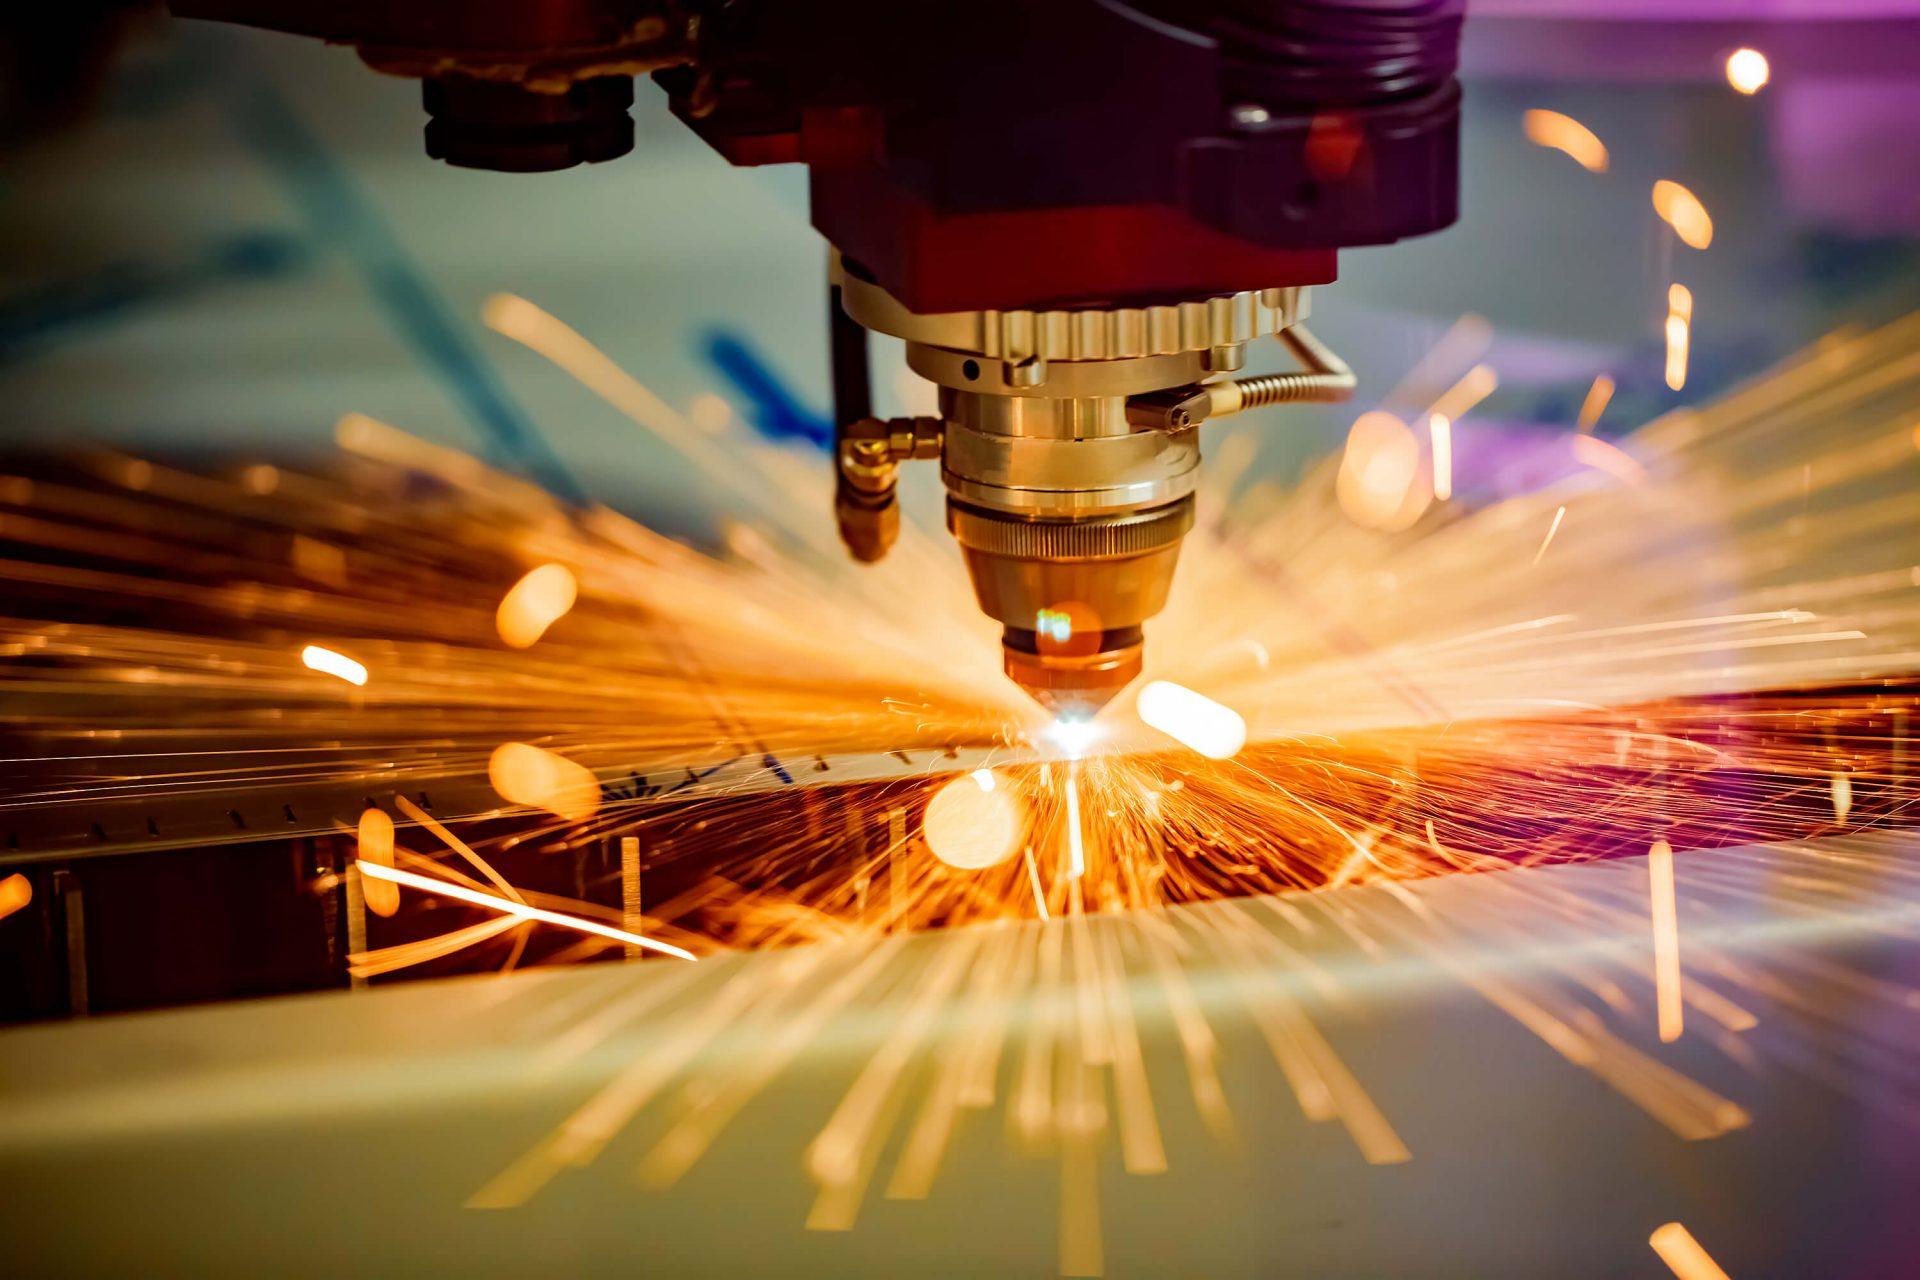 machine shop service from Rolcon